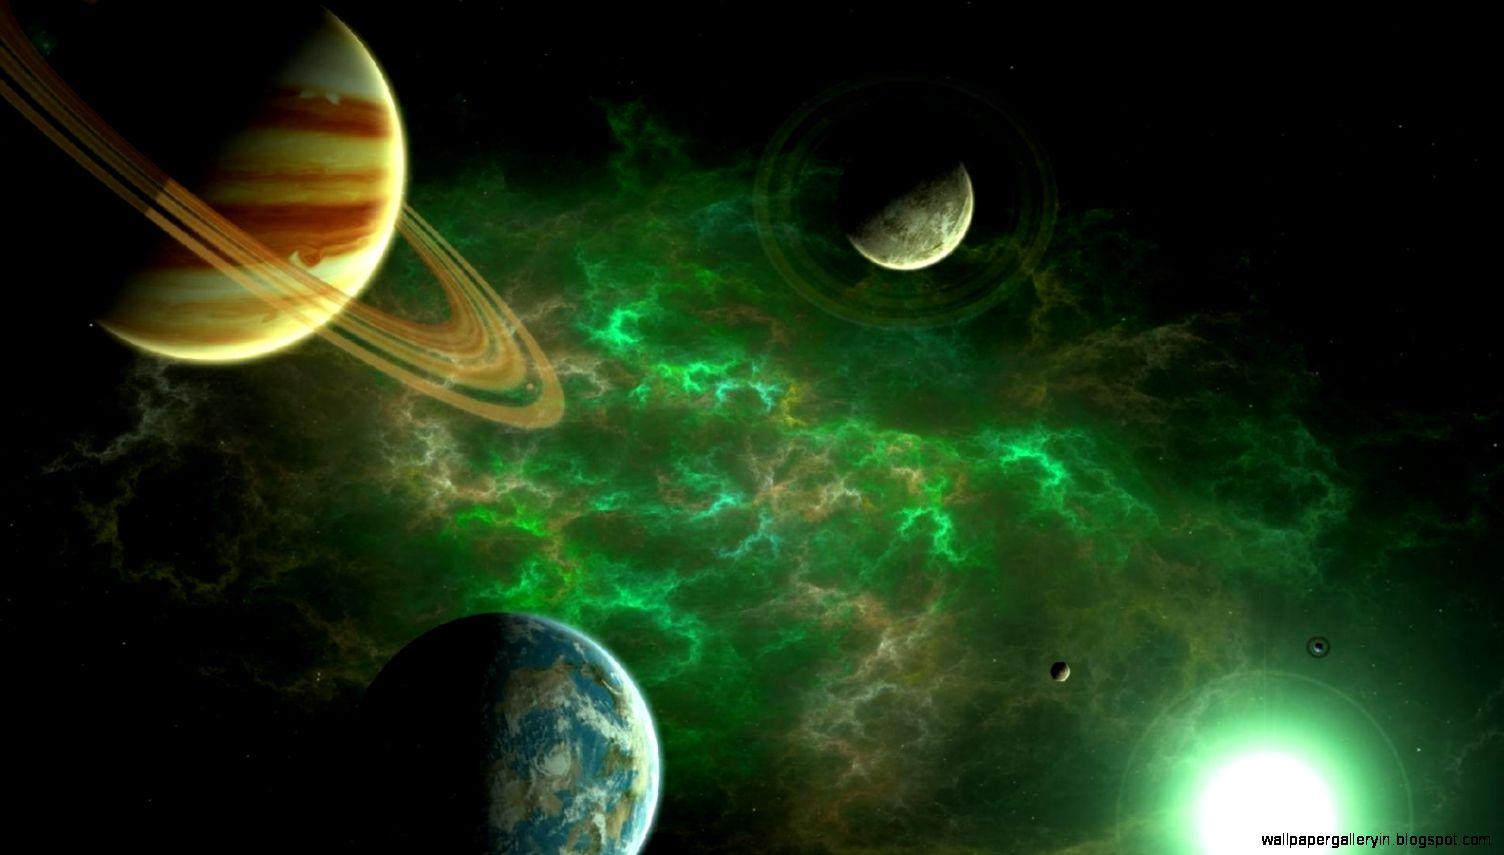 Space Universe Green Planet Hd Wallpaper Wallpaper Gallery